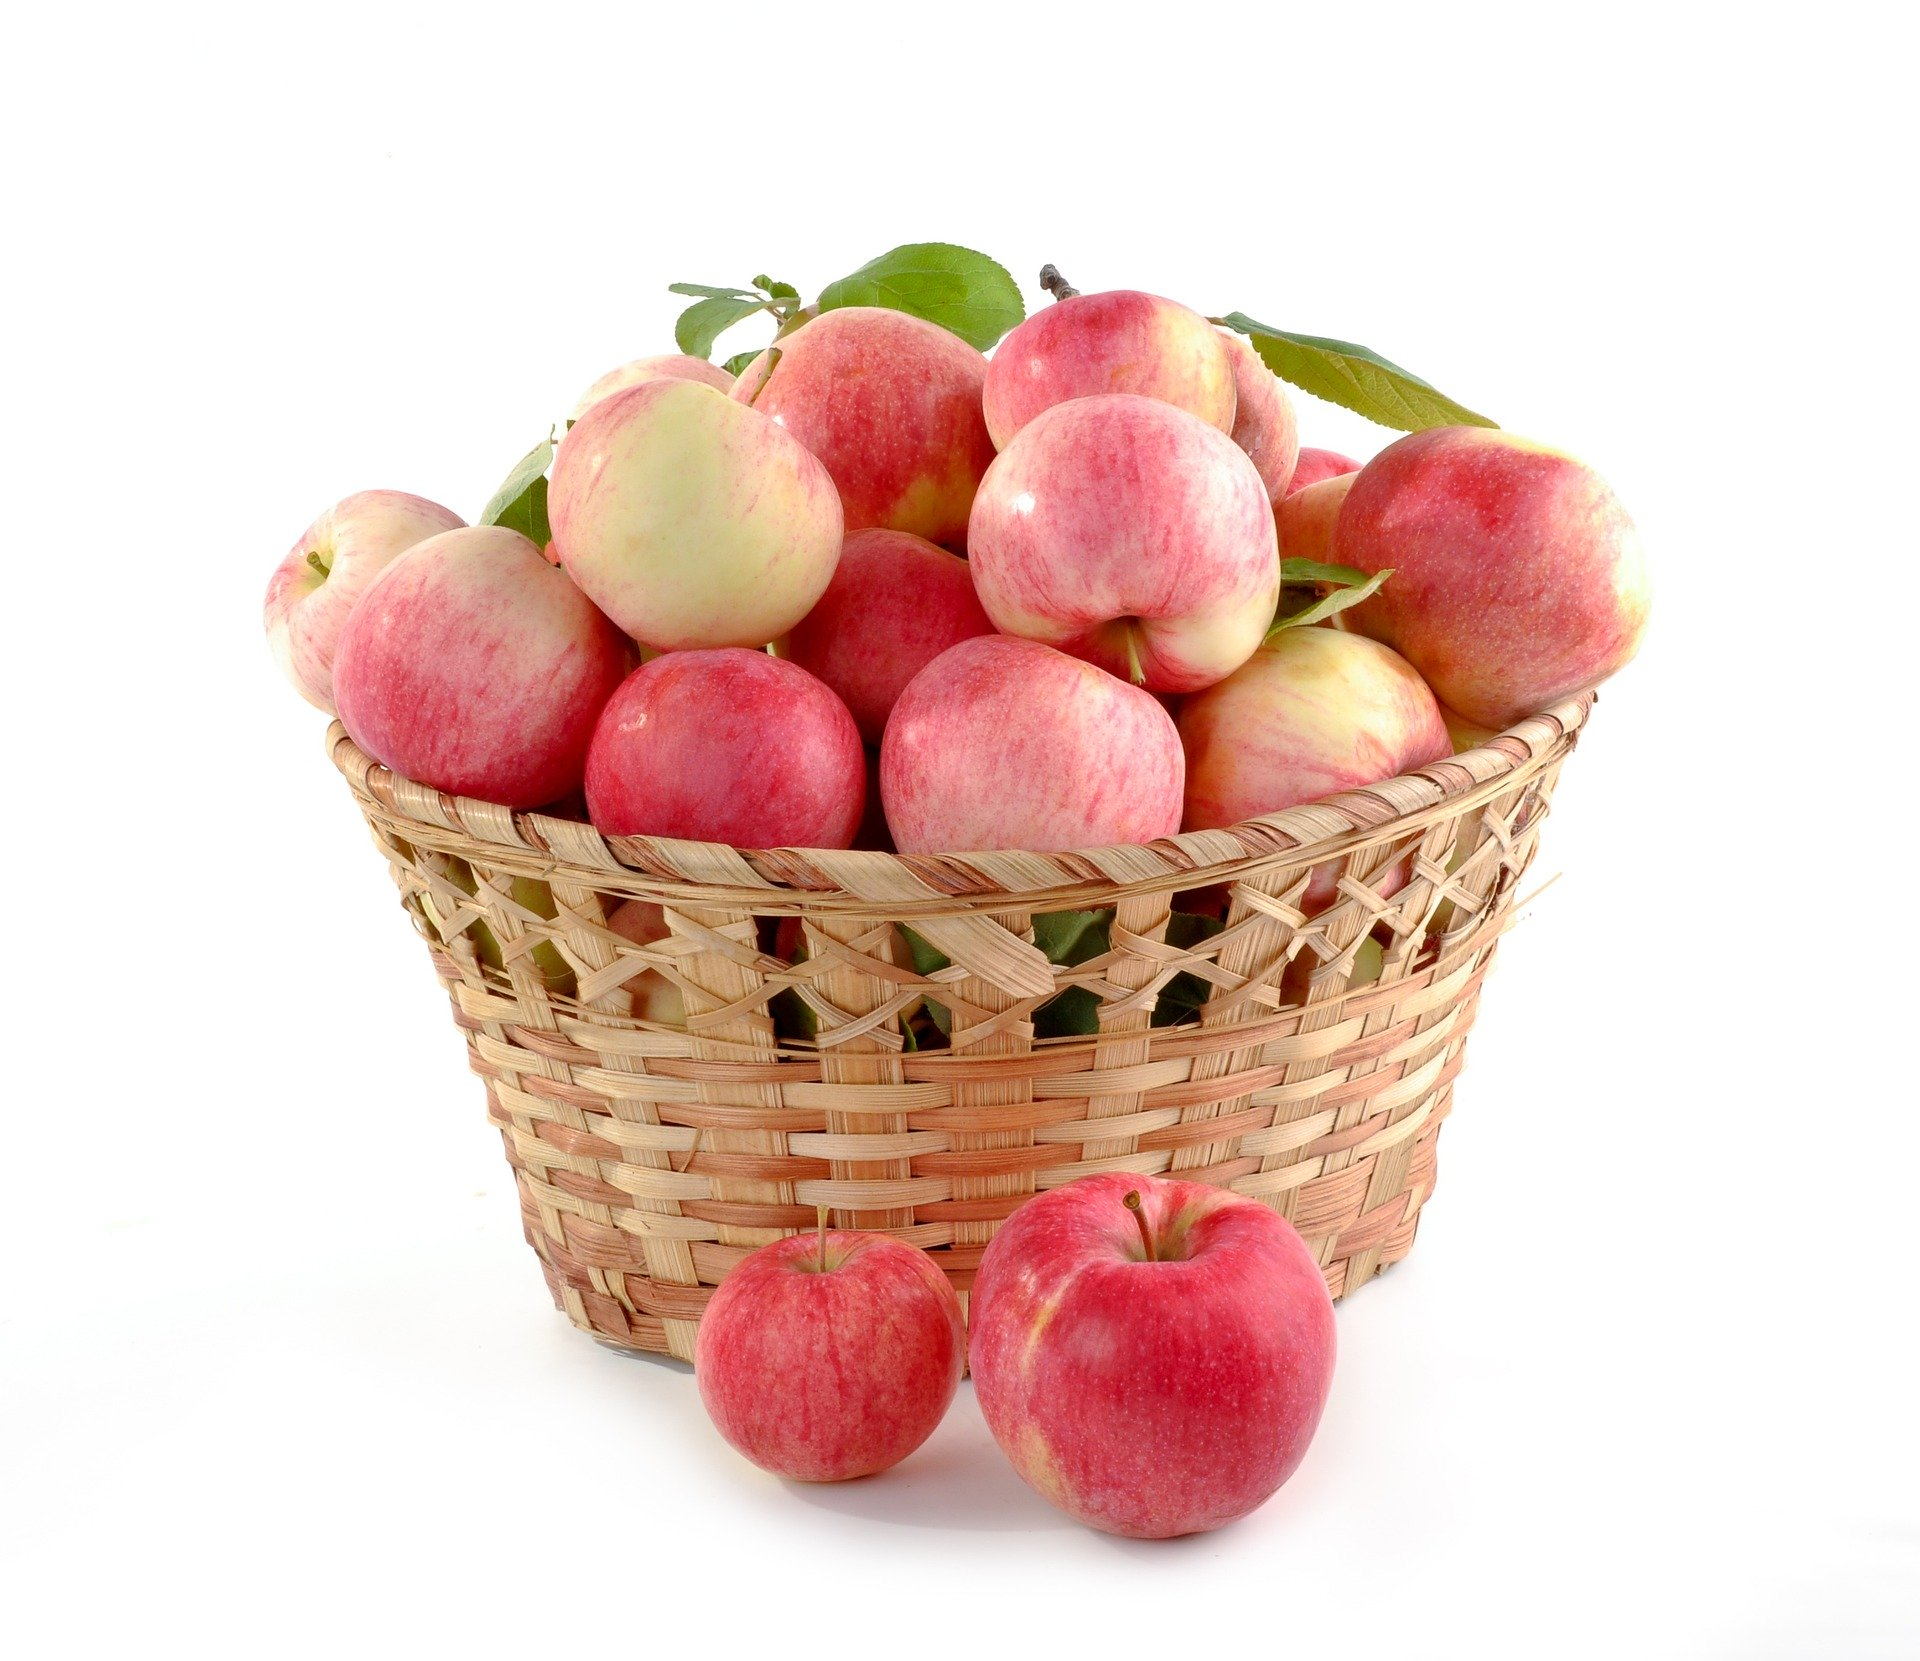 Äpfel Jonagold gelegt